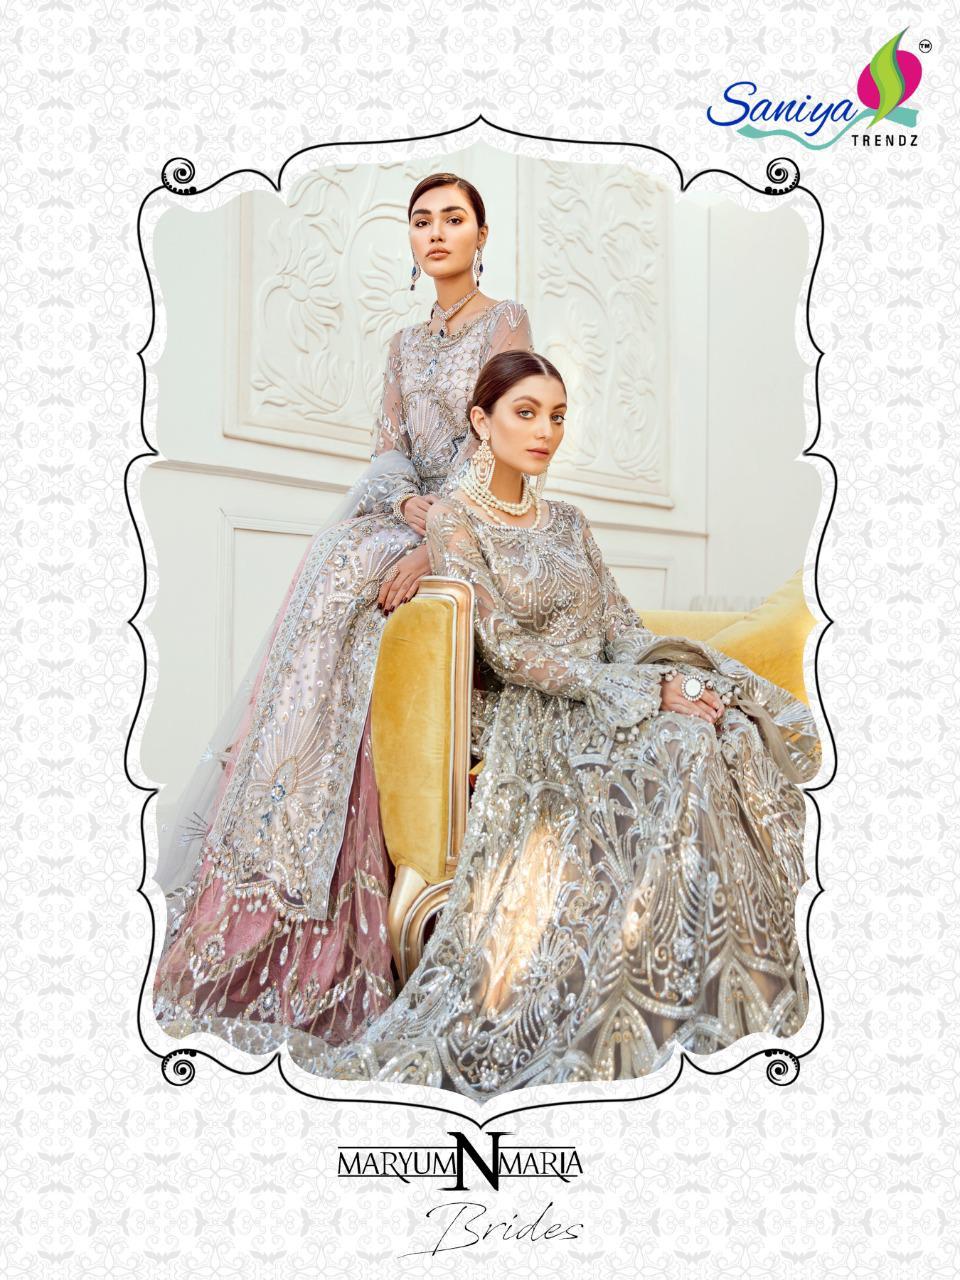 Saniya Trendz Maryum And Maria Designer Heavy Embroidery Bridal Wear Suits Wholesale